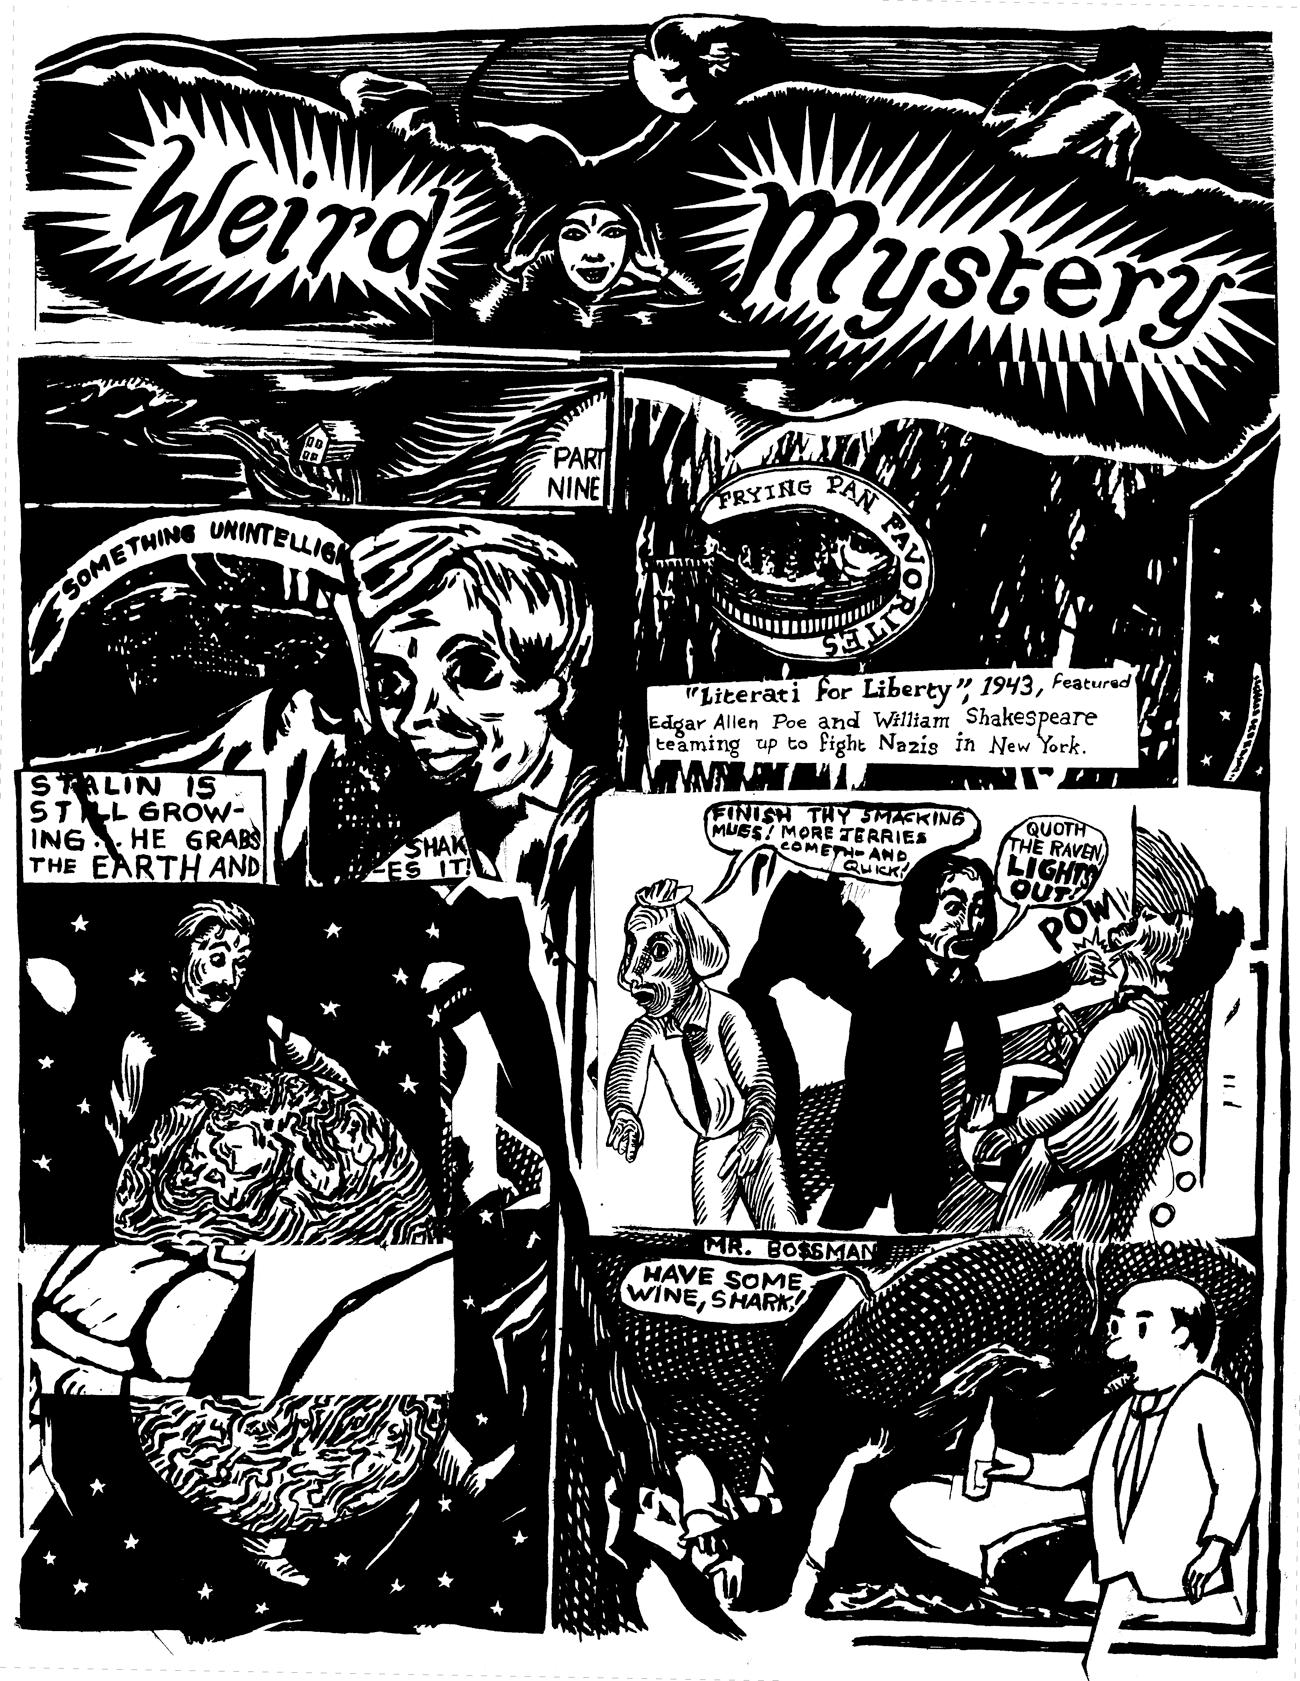 WeirdMystery.png